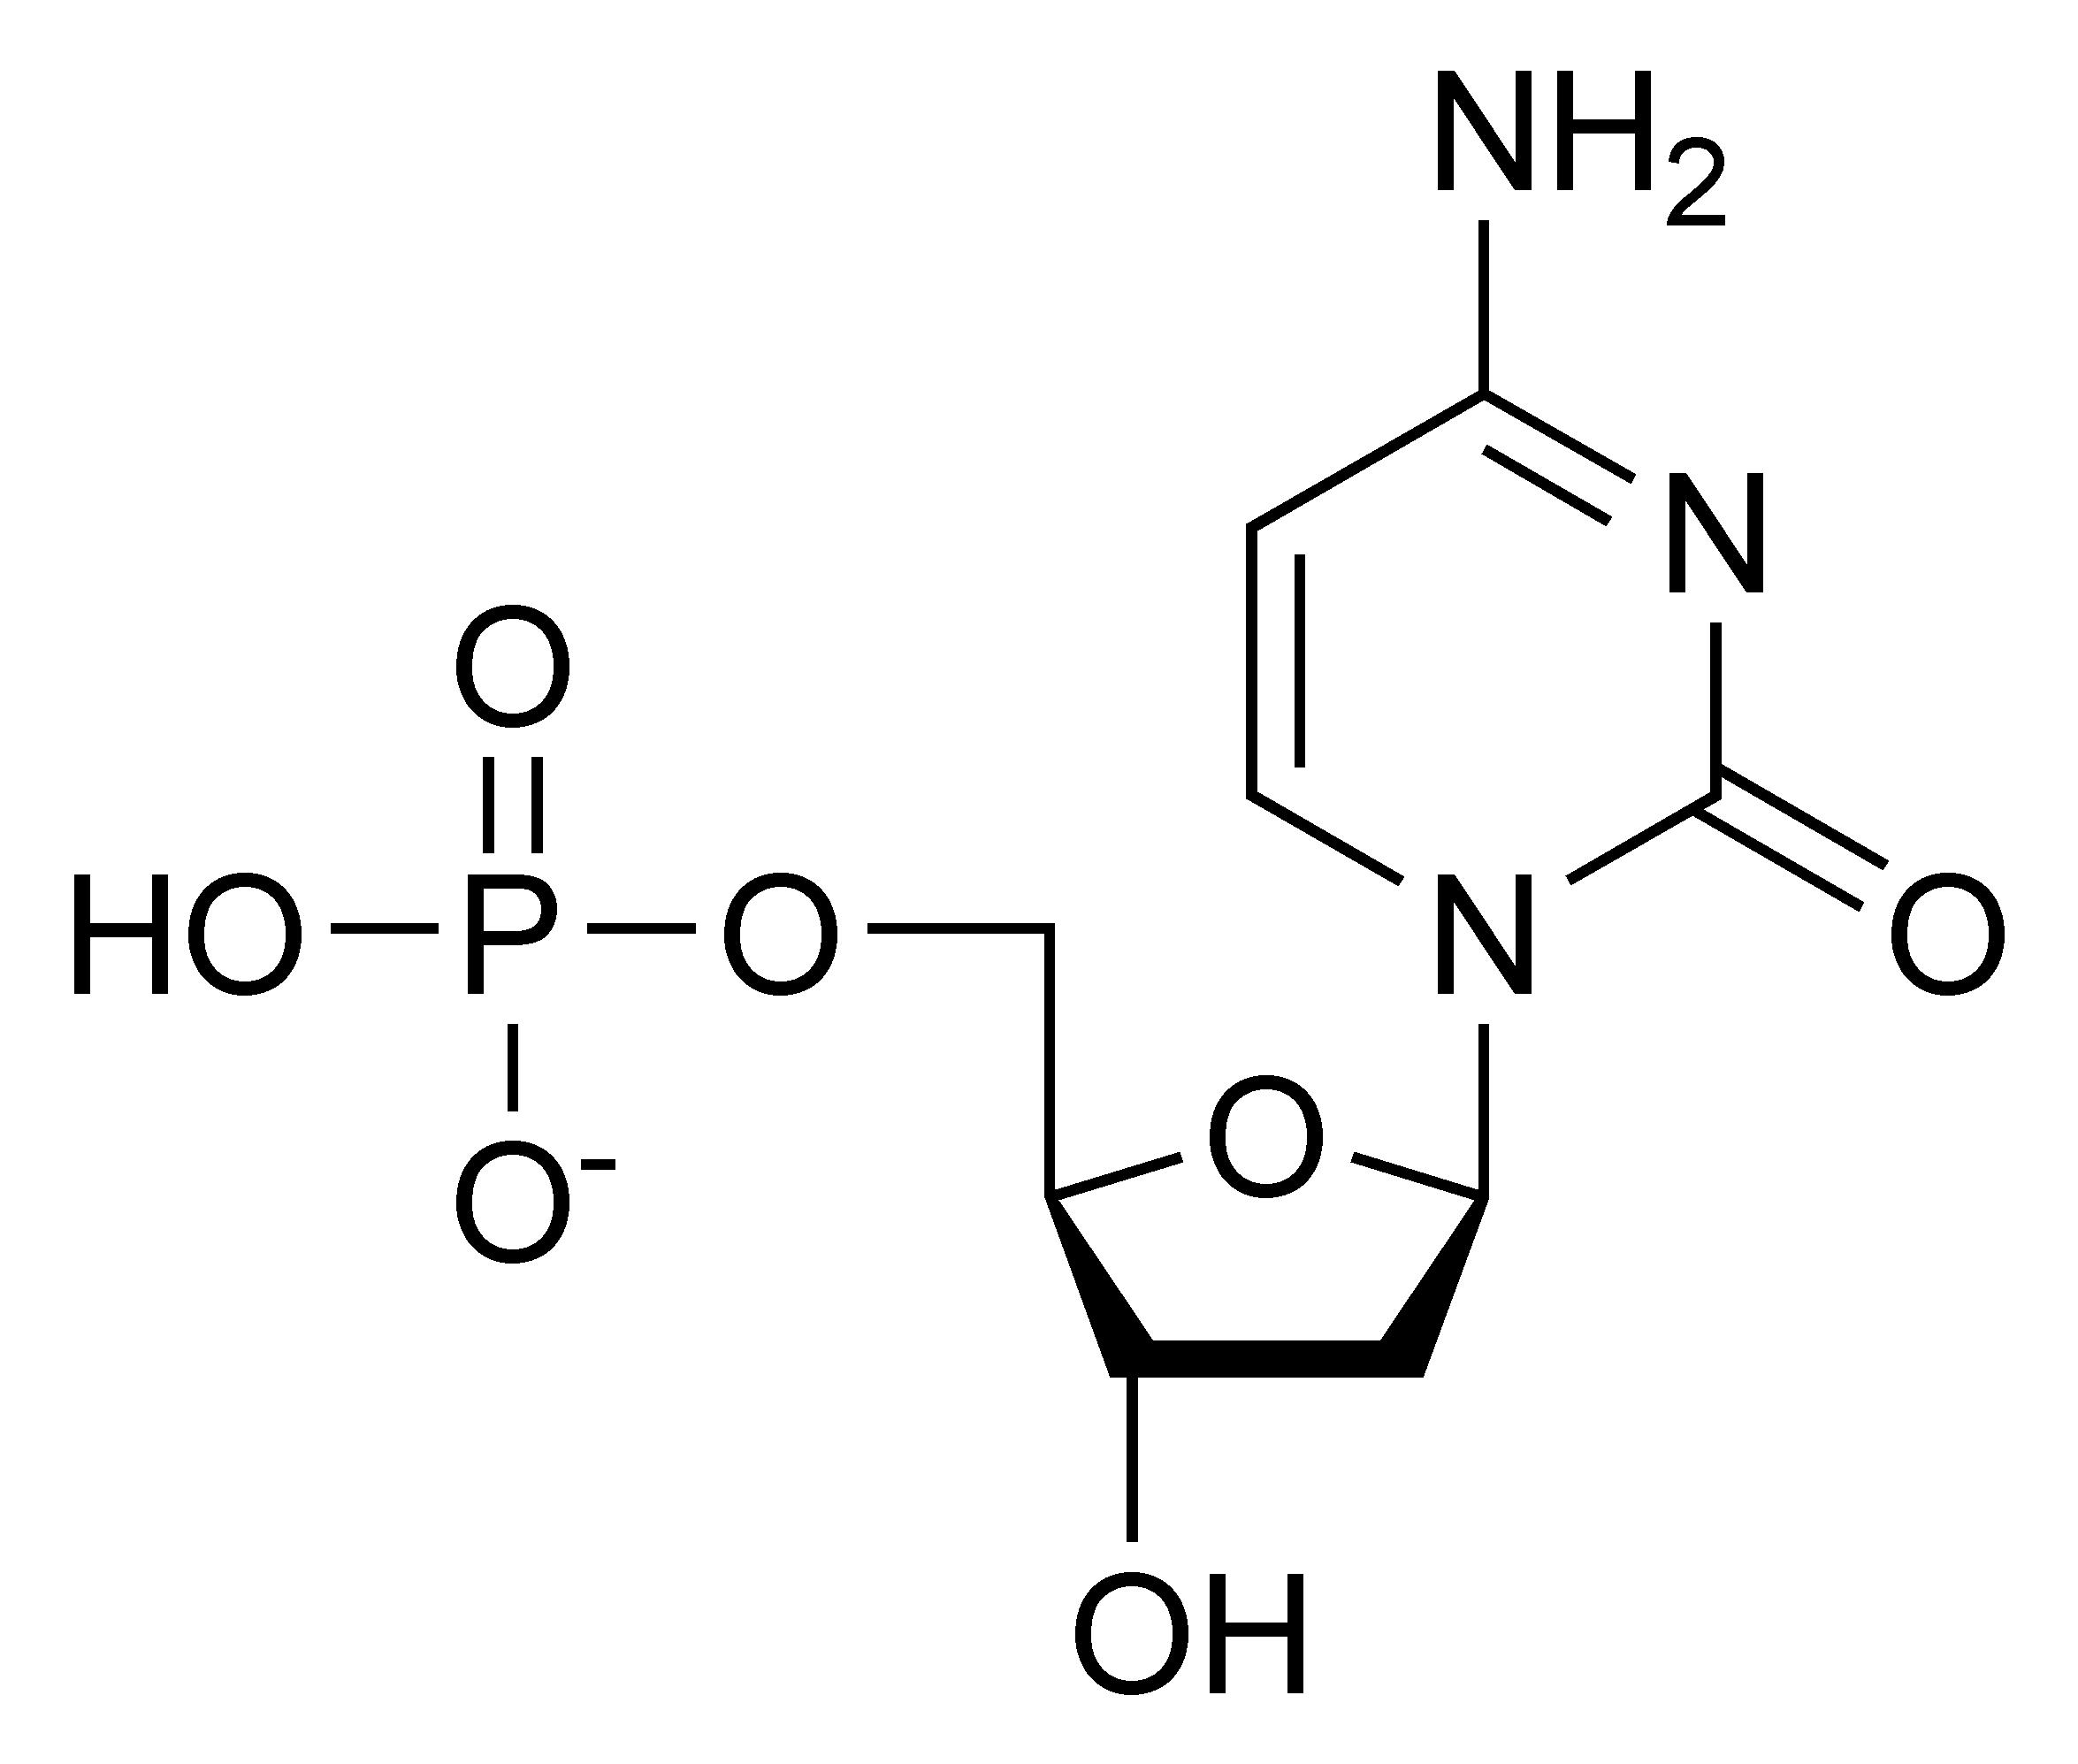 Deoxycytidine monophosphate